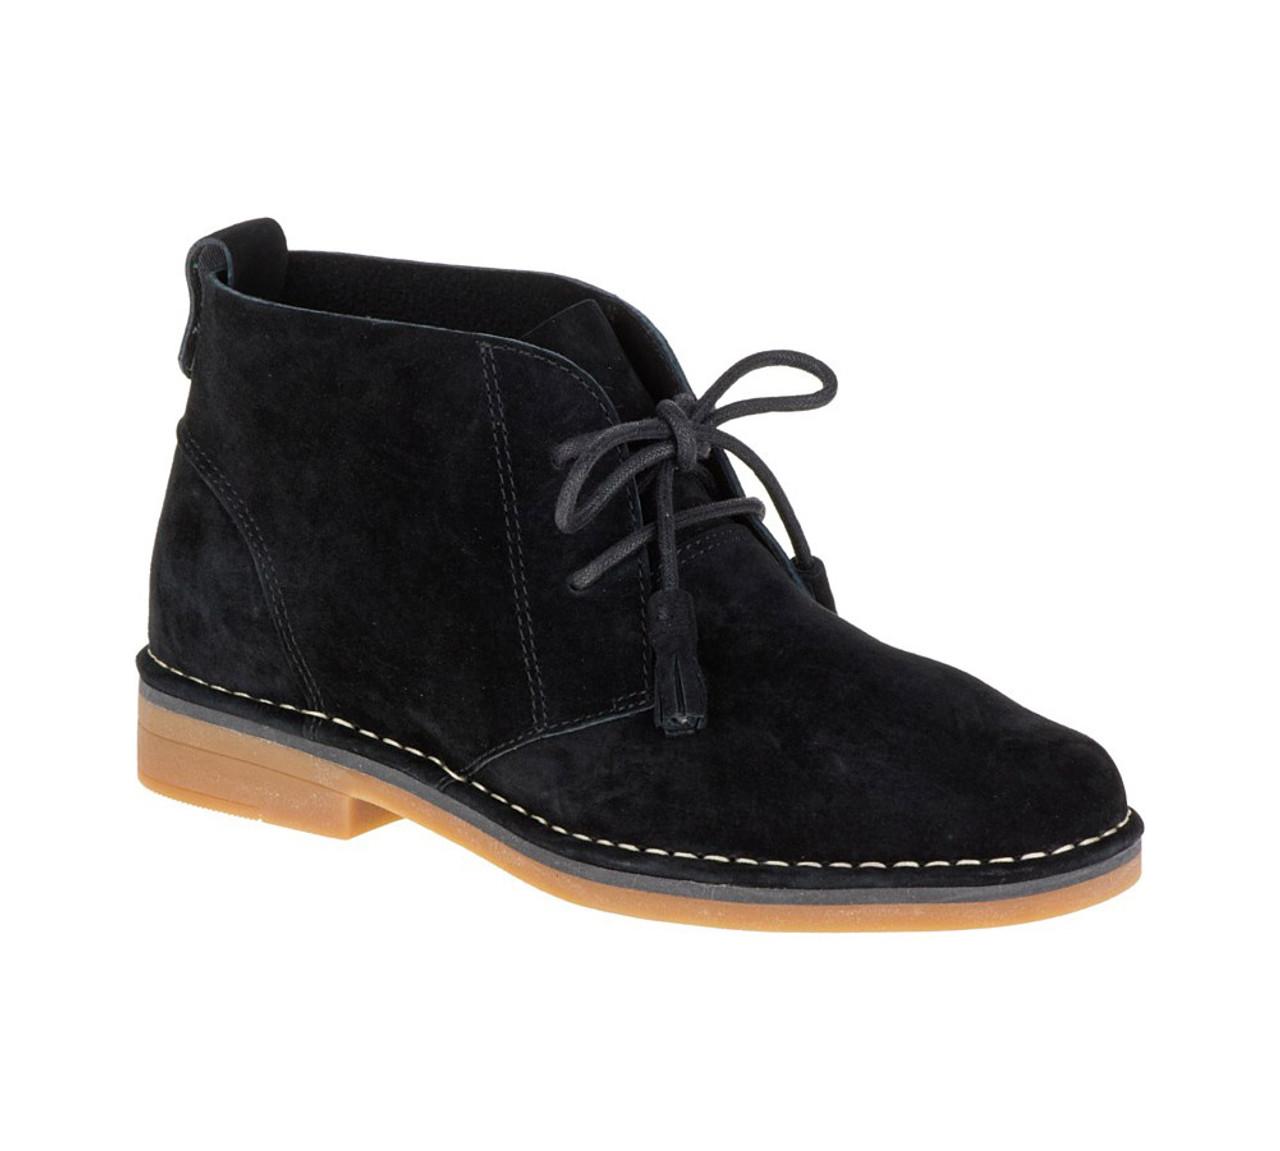 394eea88b59 Hush Puppies Women's Cyra Catelyn Chukka Boot Black Suede